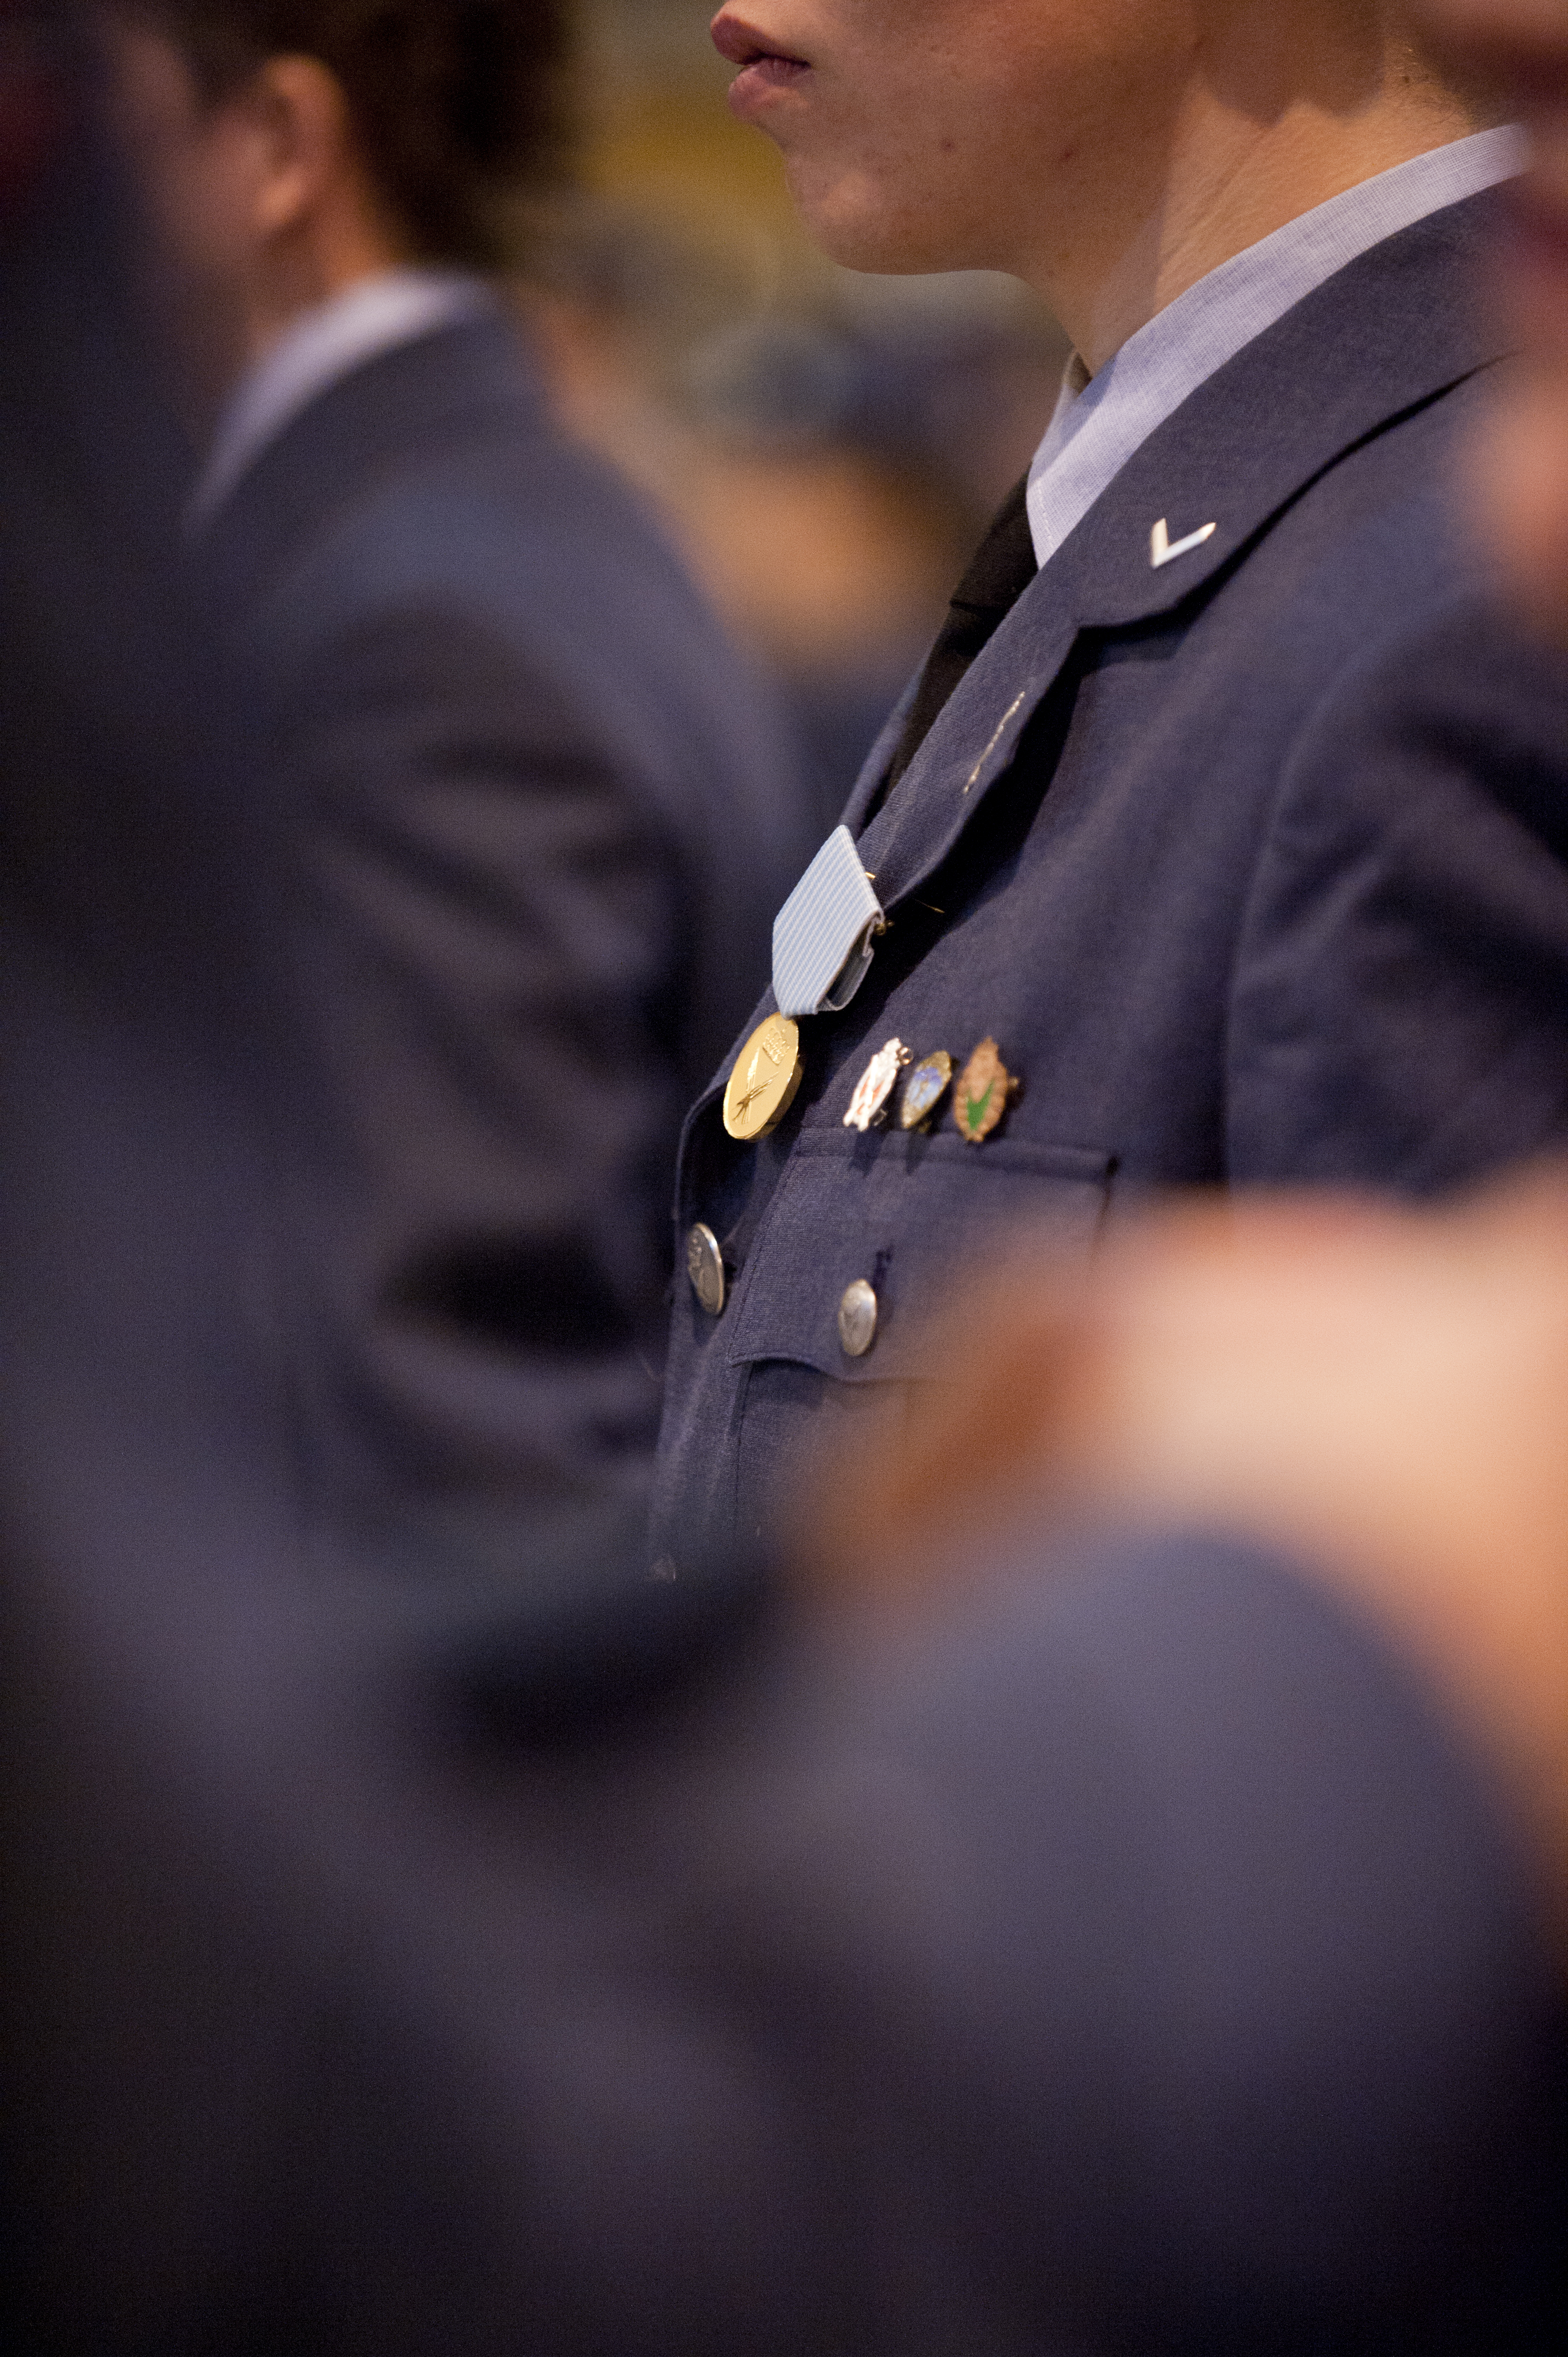 Luftforsvaret_1